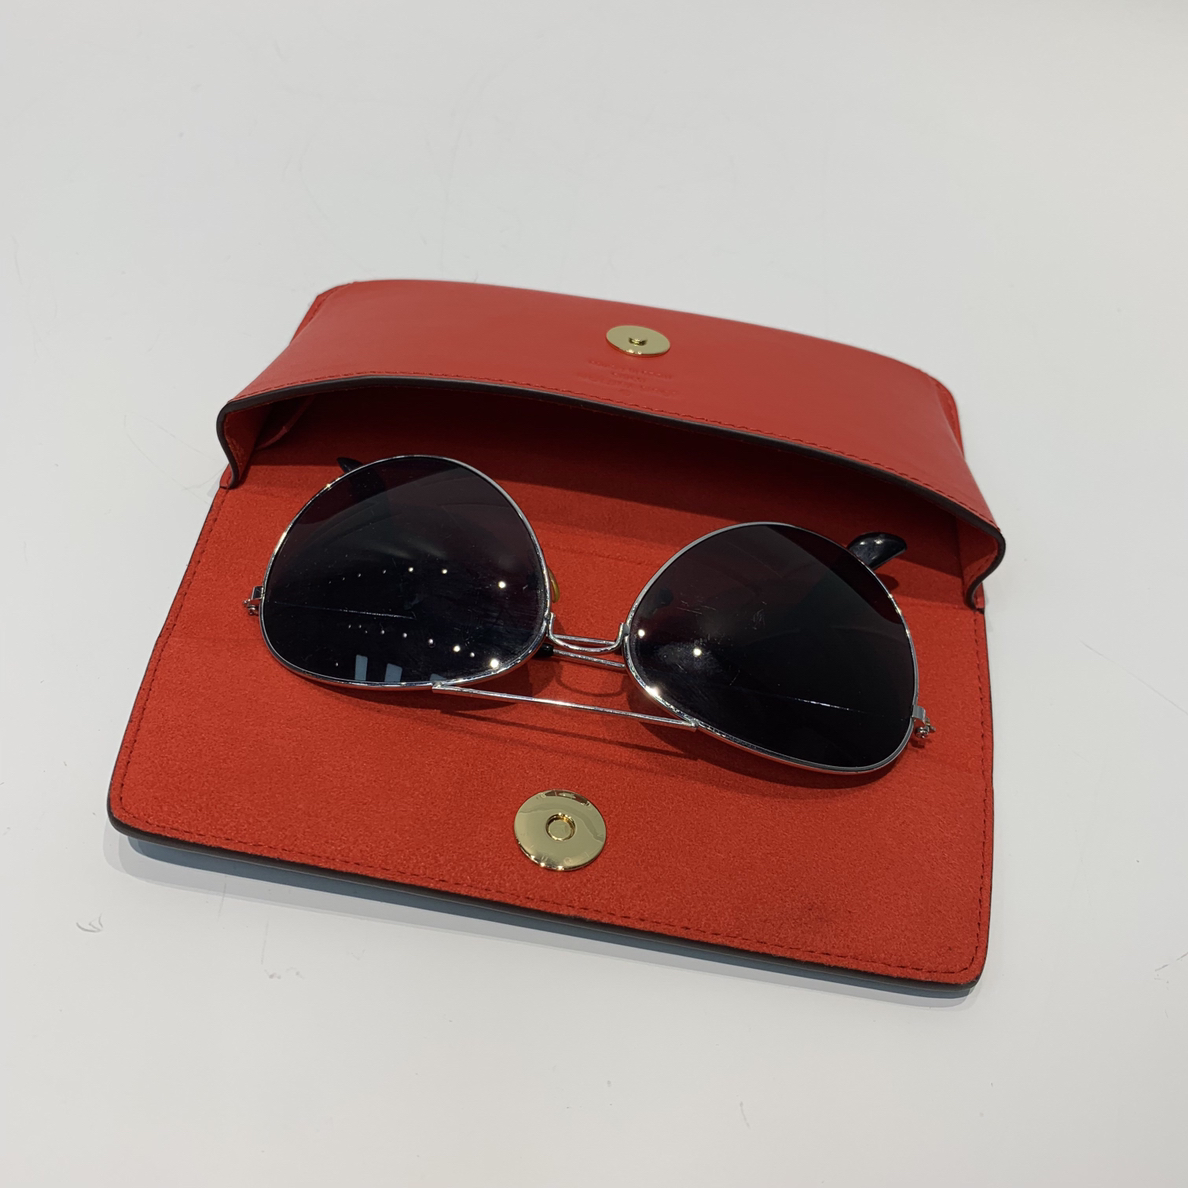 LV包包批发 眼镜的最佳伴侣眼镜包44355 保护心爱的墨镜